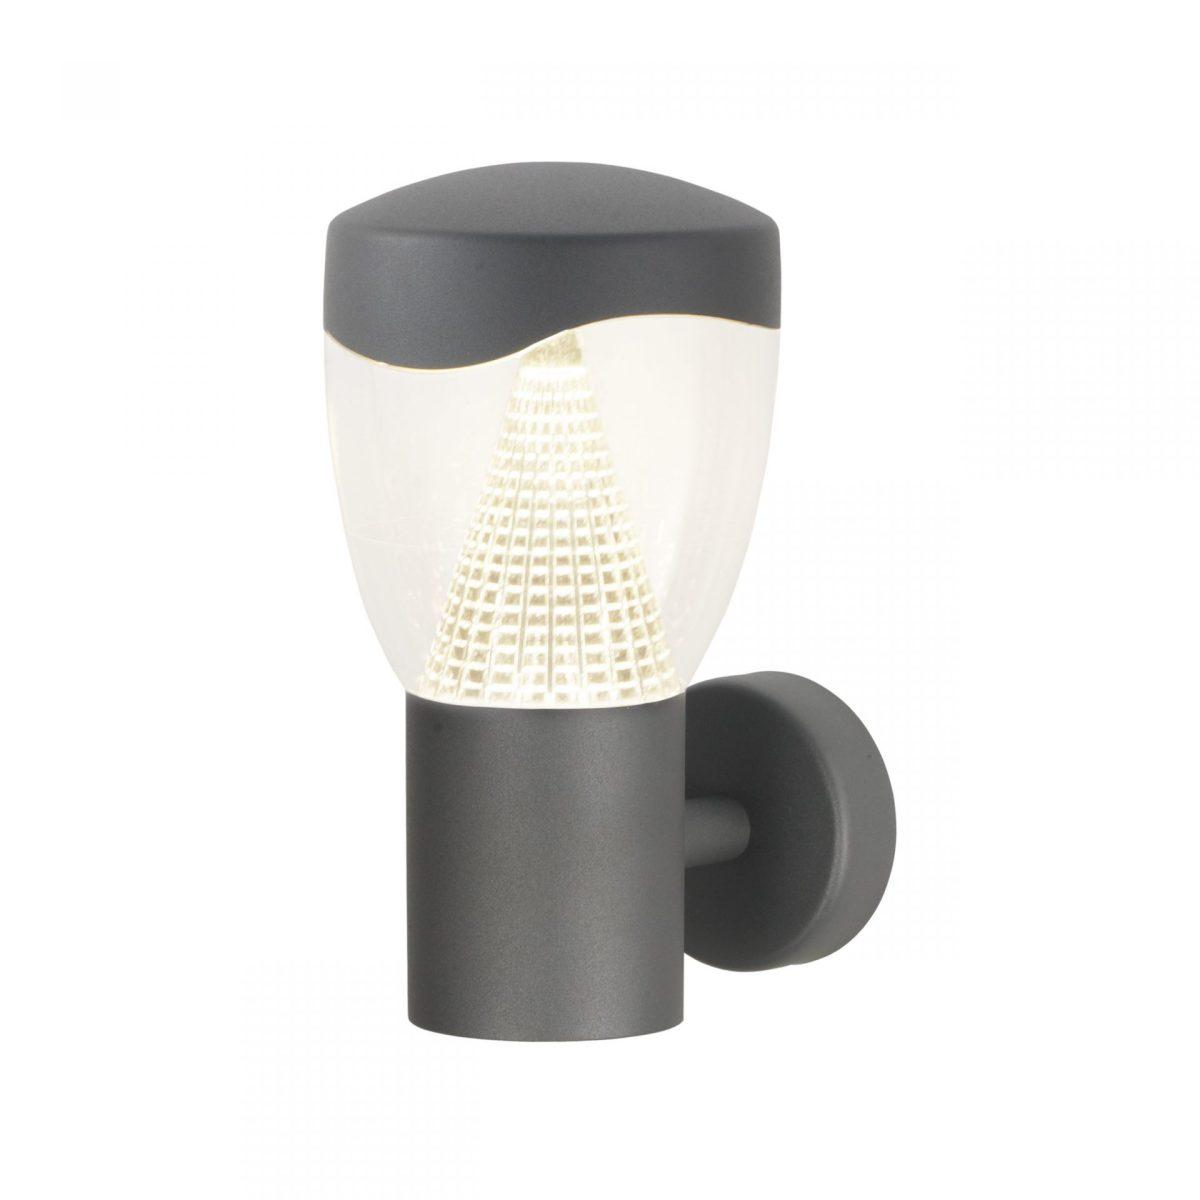 L10 Outdoor Wall Light